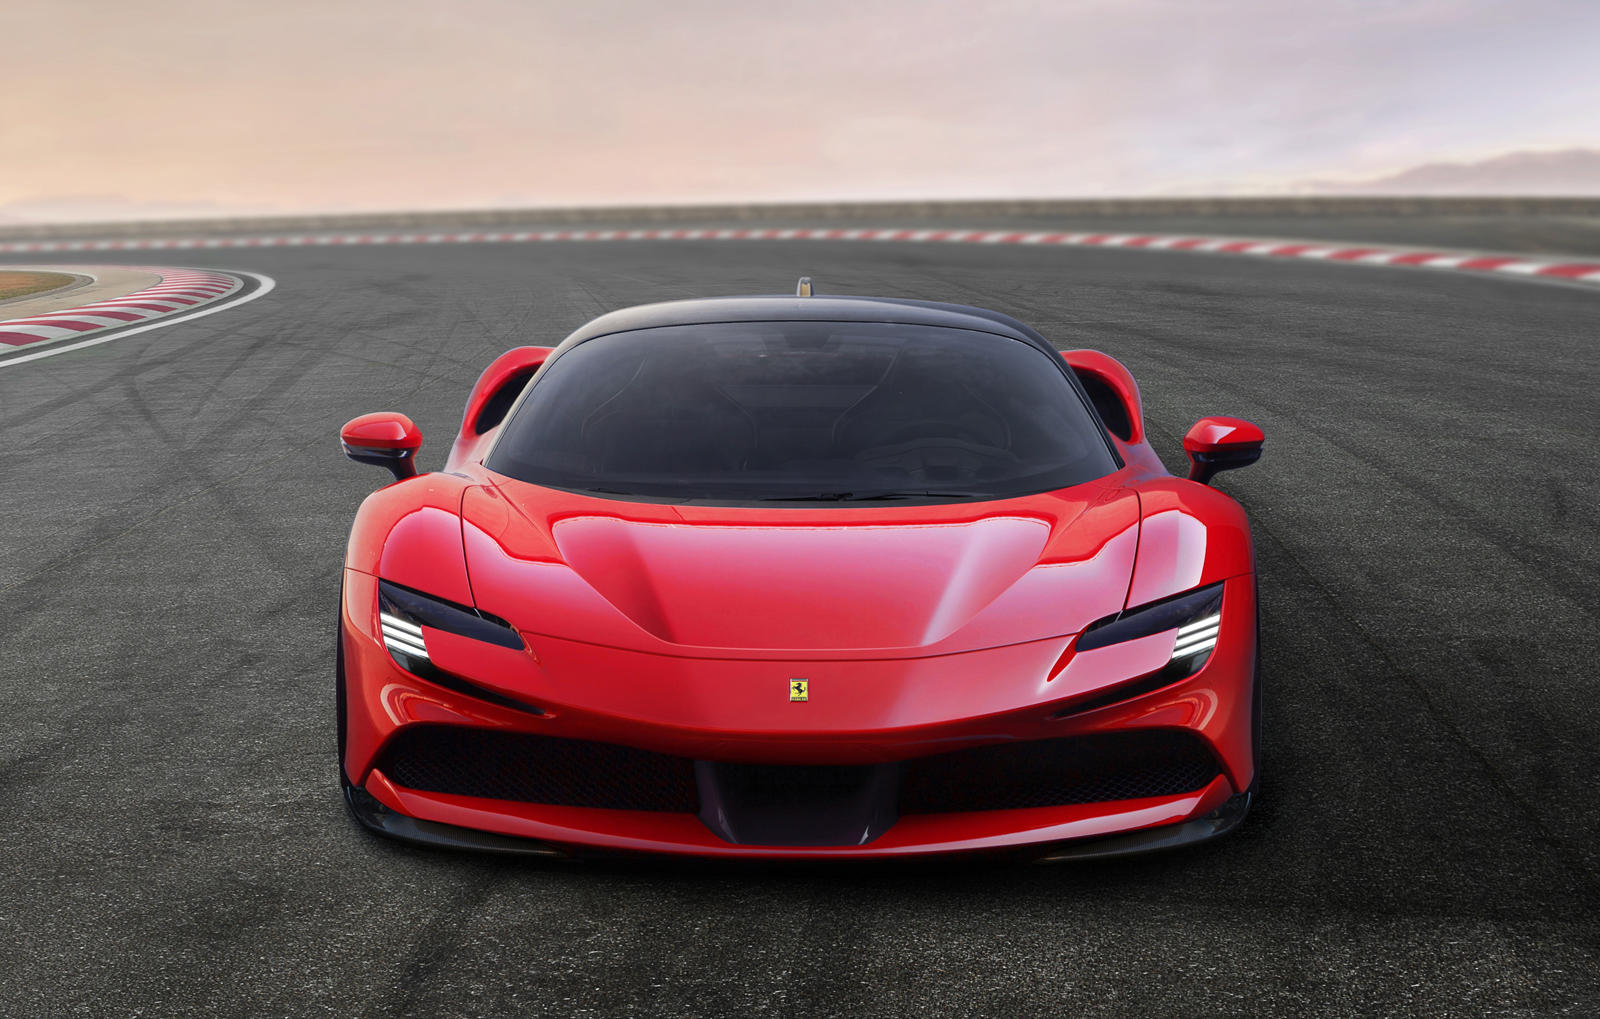 Ferrari Sf90 Stradale 1 000 Cv 05